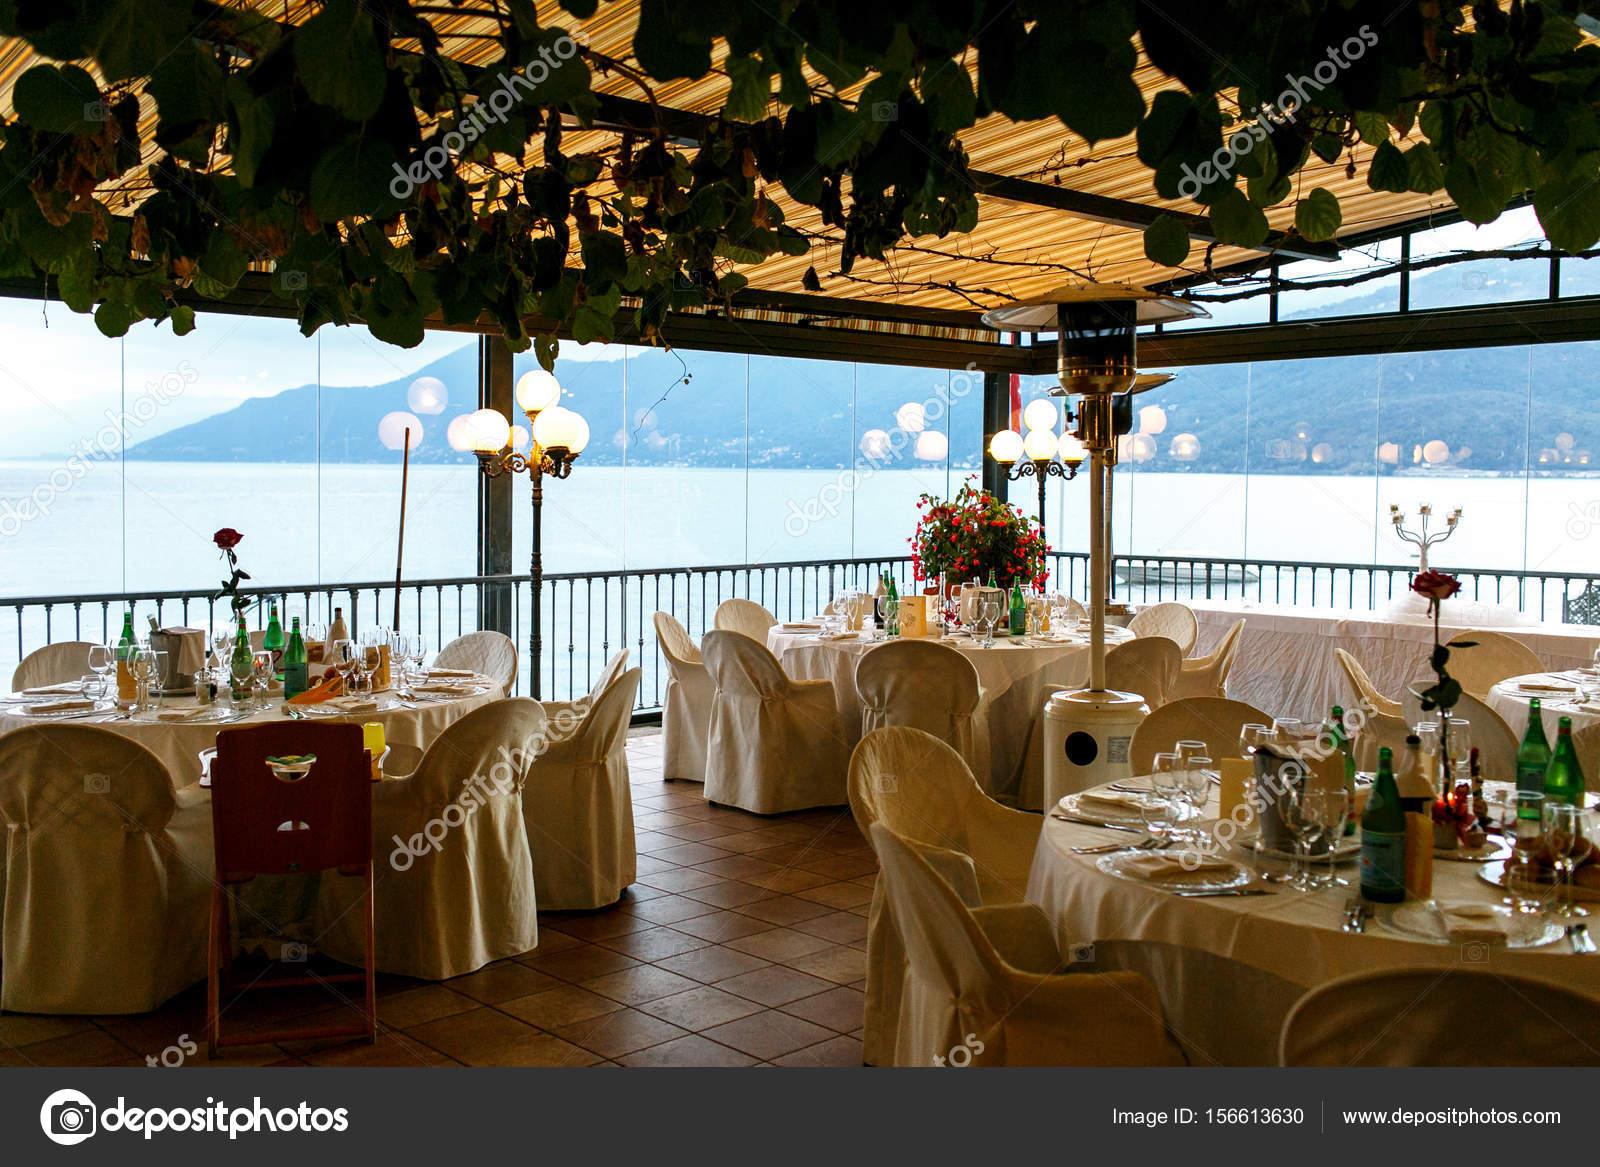 Verdure Est Suspendu Au Plafond Du Restaurant Avec Grand Bleu